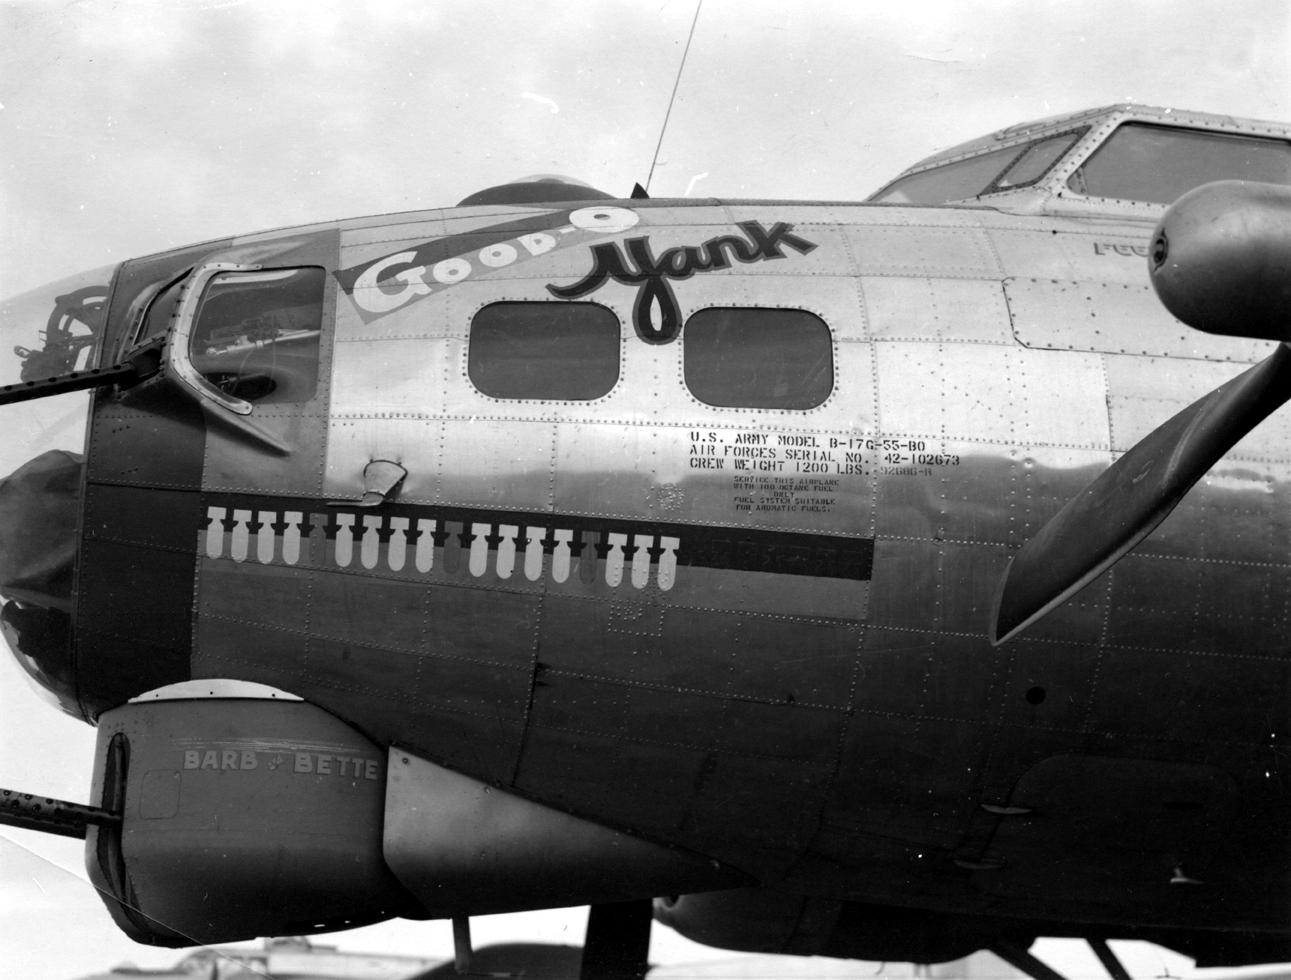 B-17 #42-102673 / Good Old Yank aka Preferred Risk